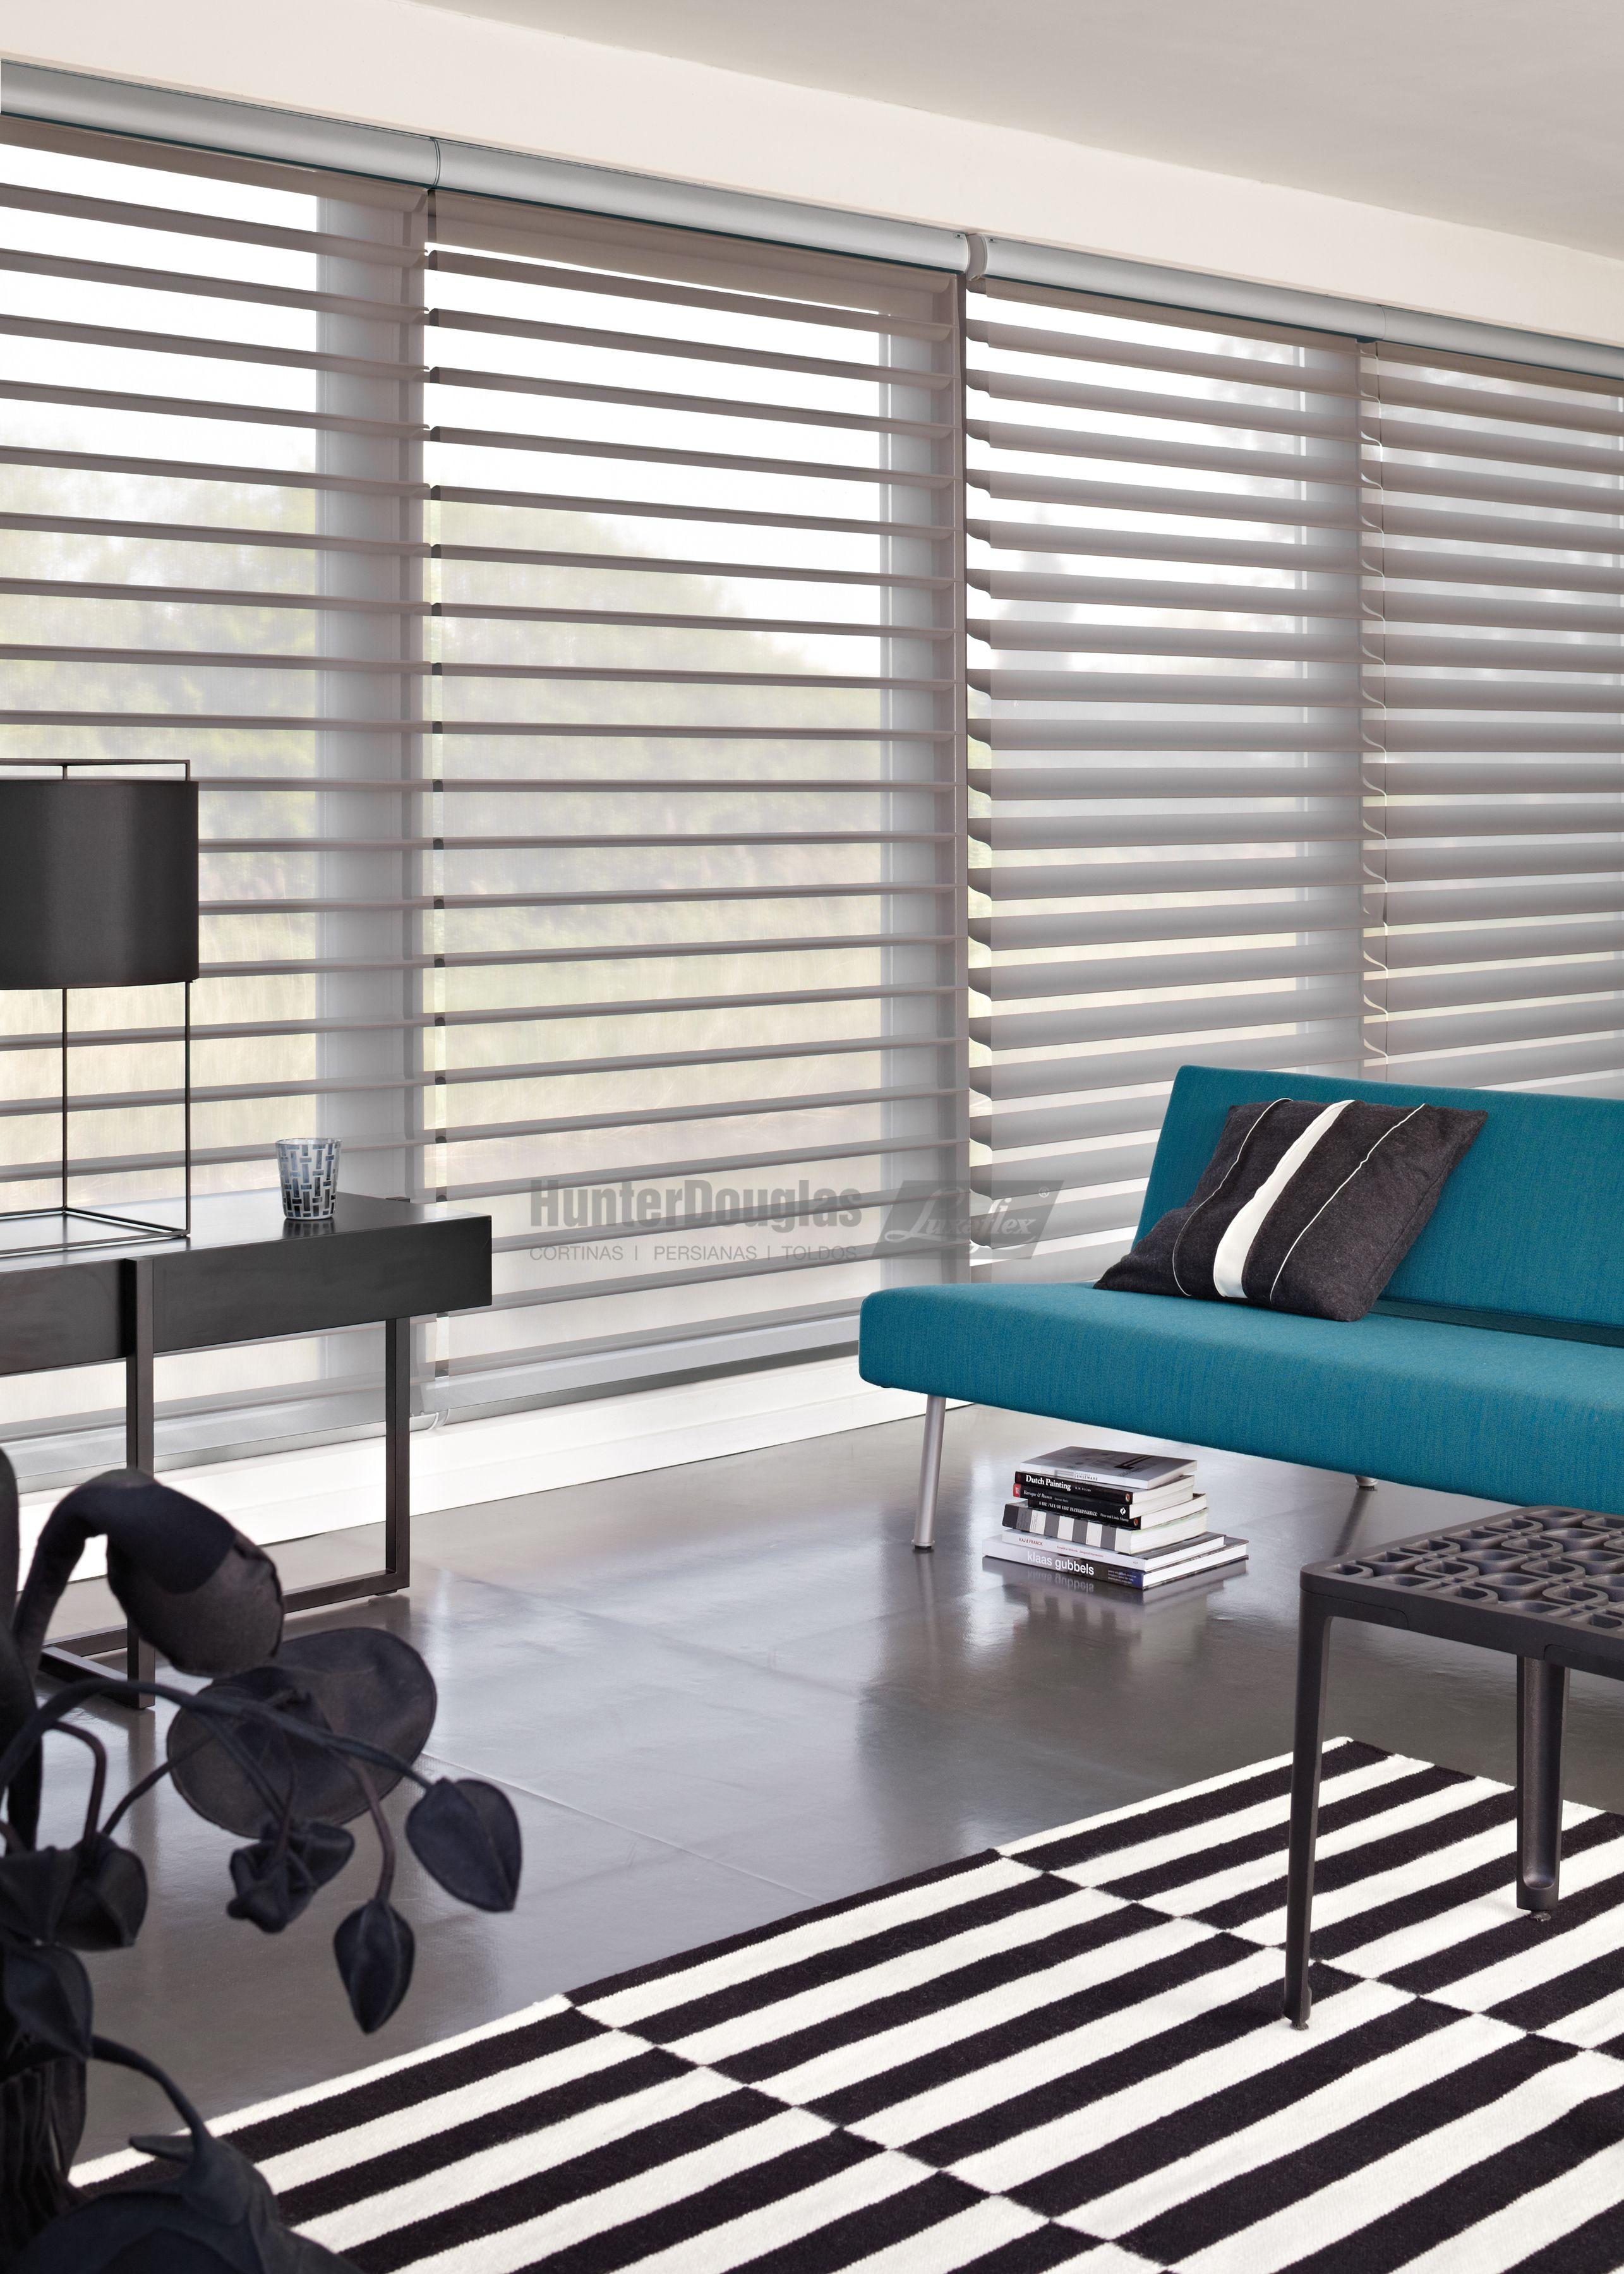 cortinas silhouette hunterdouglas luxaflex cortinas. Black Bedroom Furniture Sets. Home Design Ideas